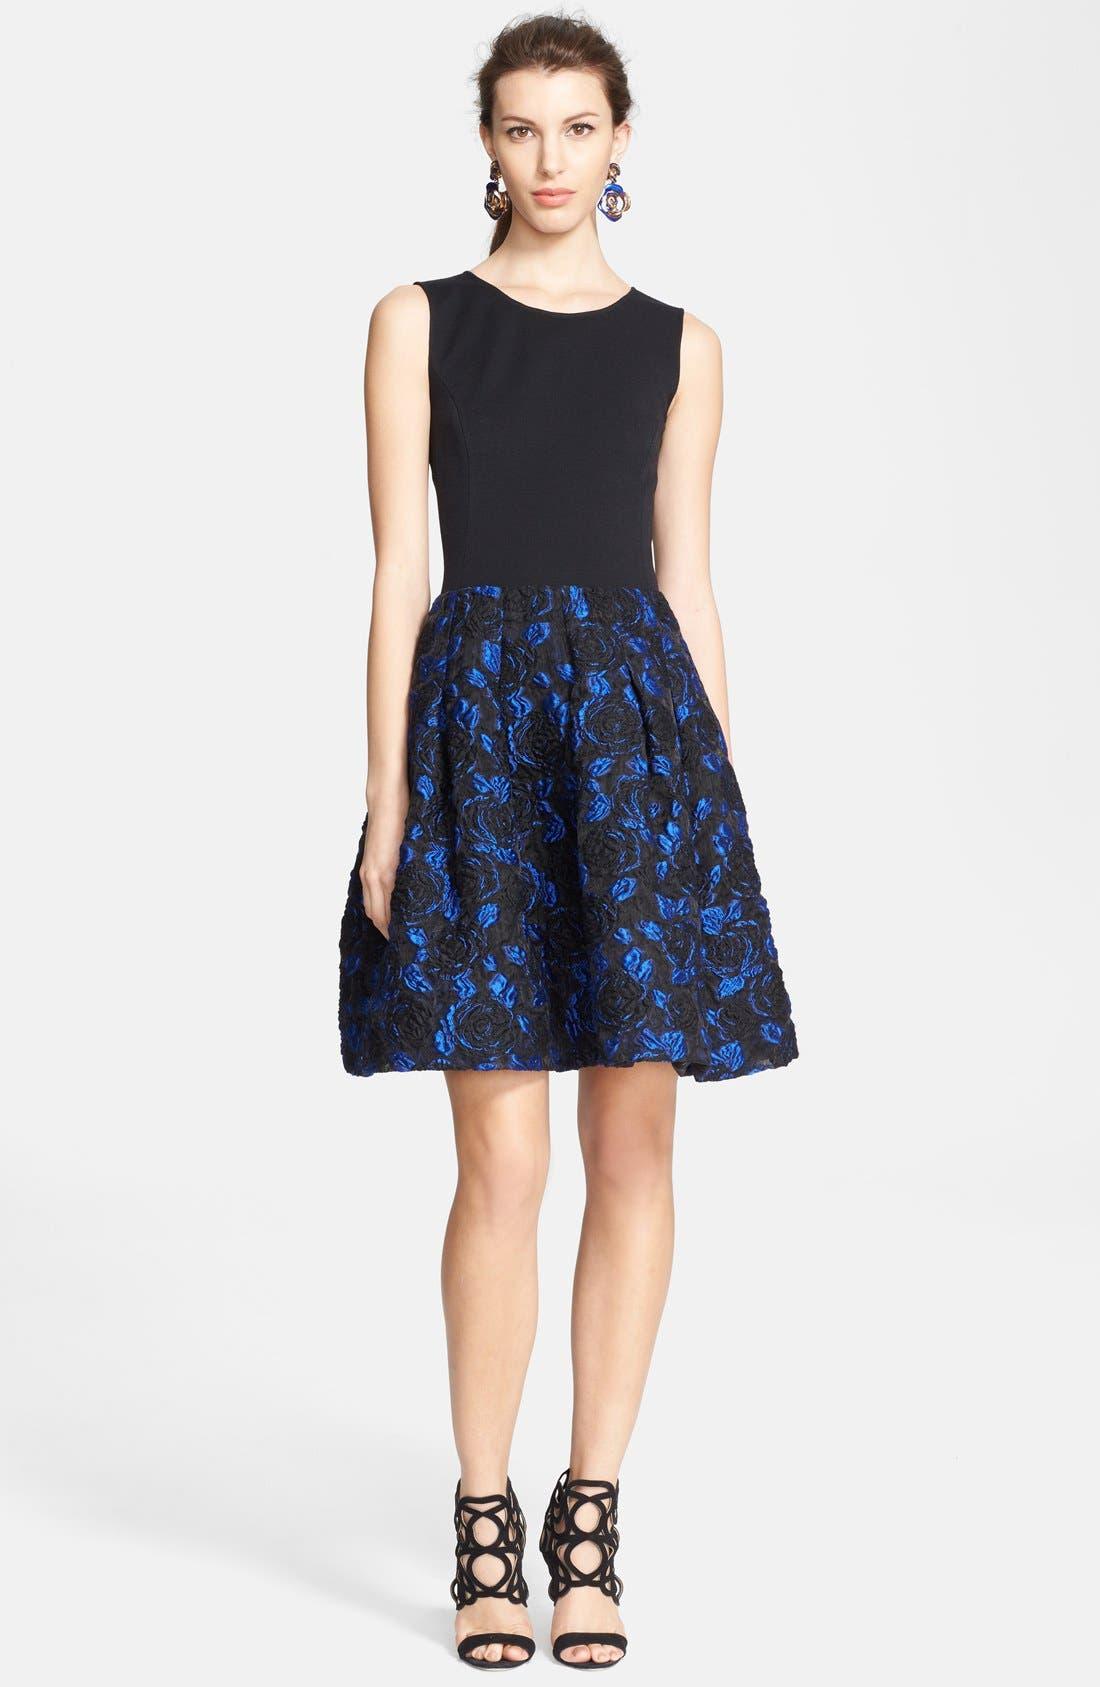 Main Image - Oscar de la Renta Jacquard Skirt Fit & Flare Dress